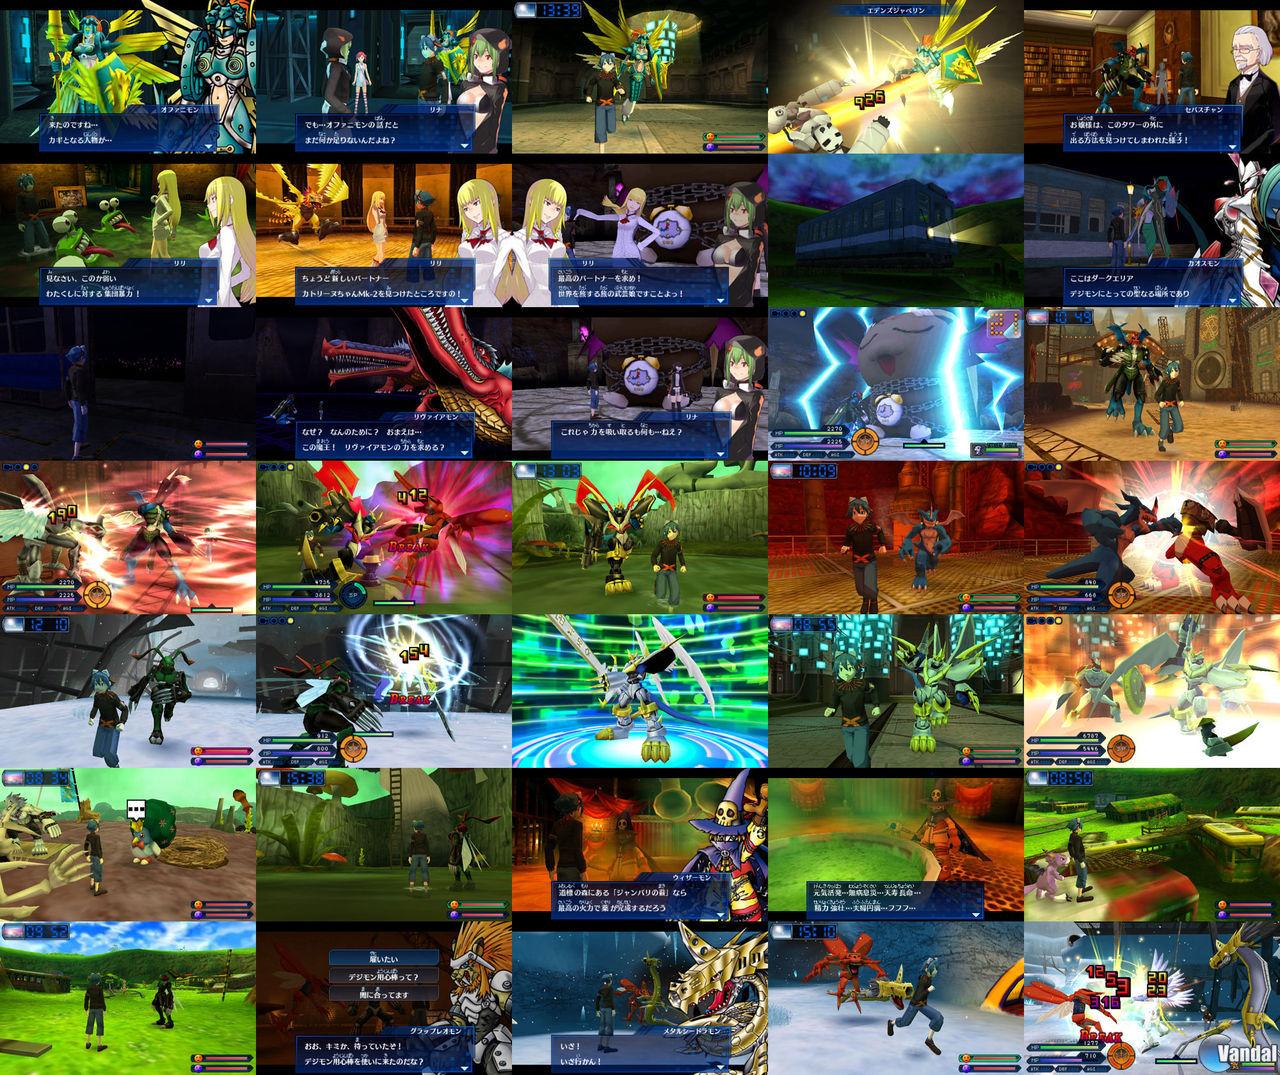 Digimon world re digitize evolve guide | Digimon World Re